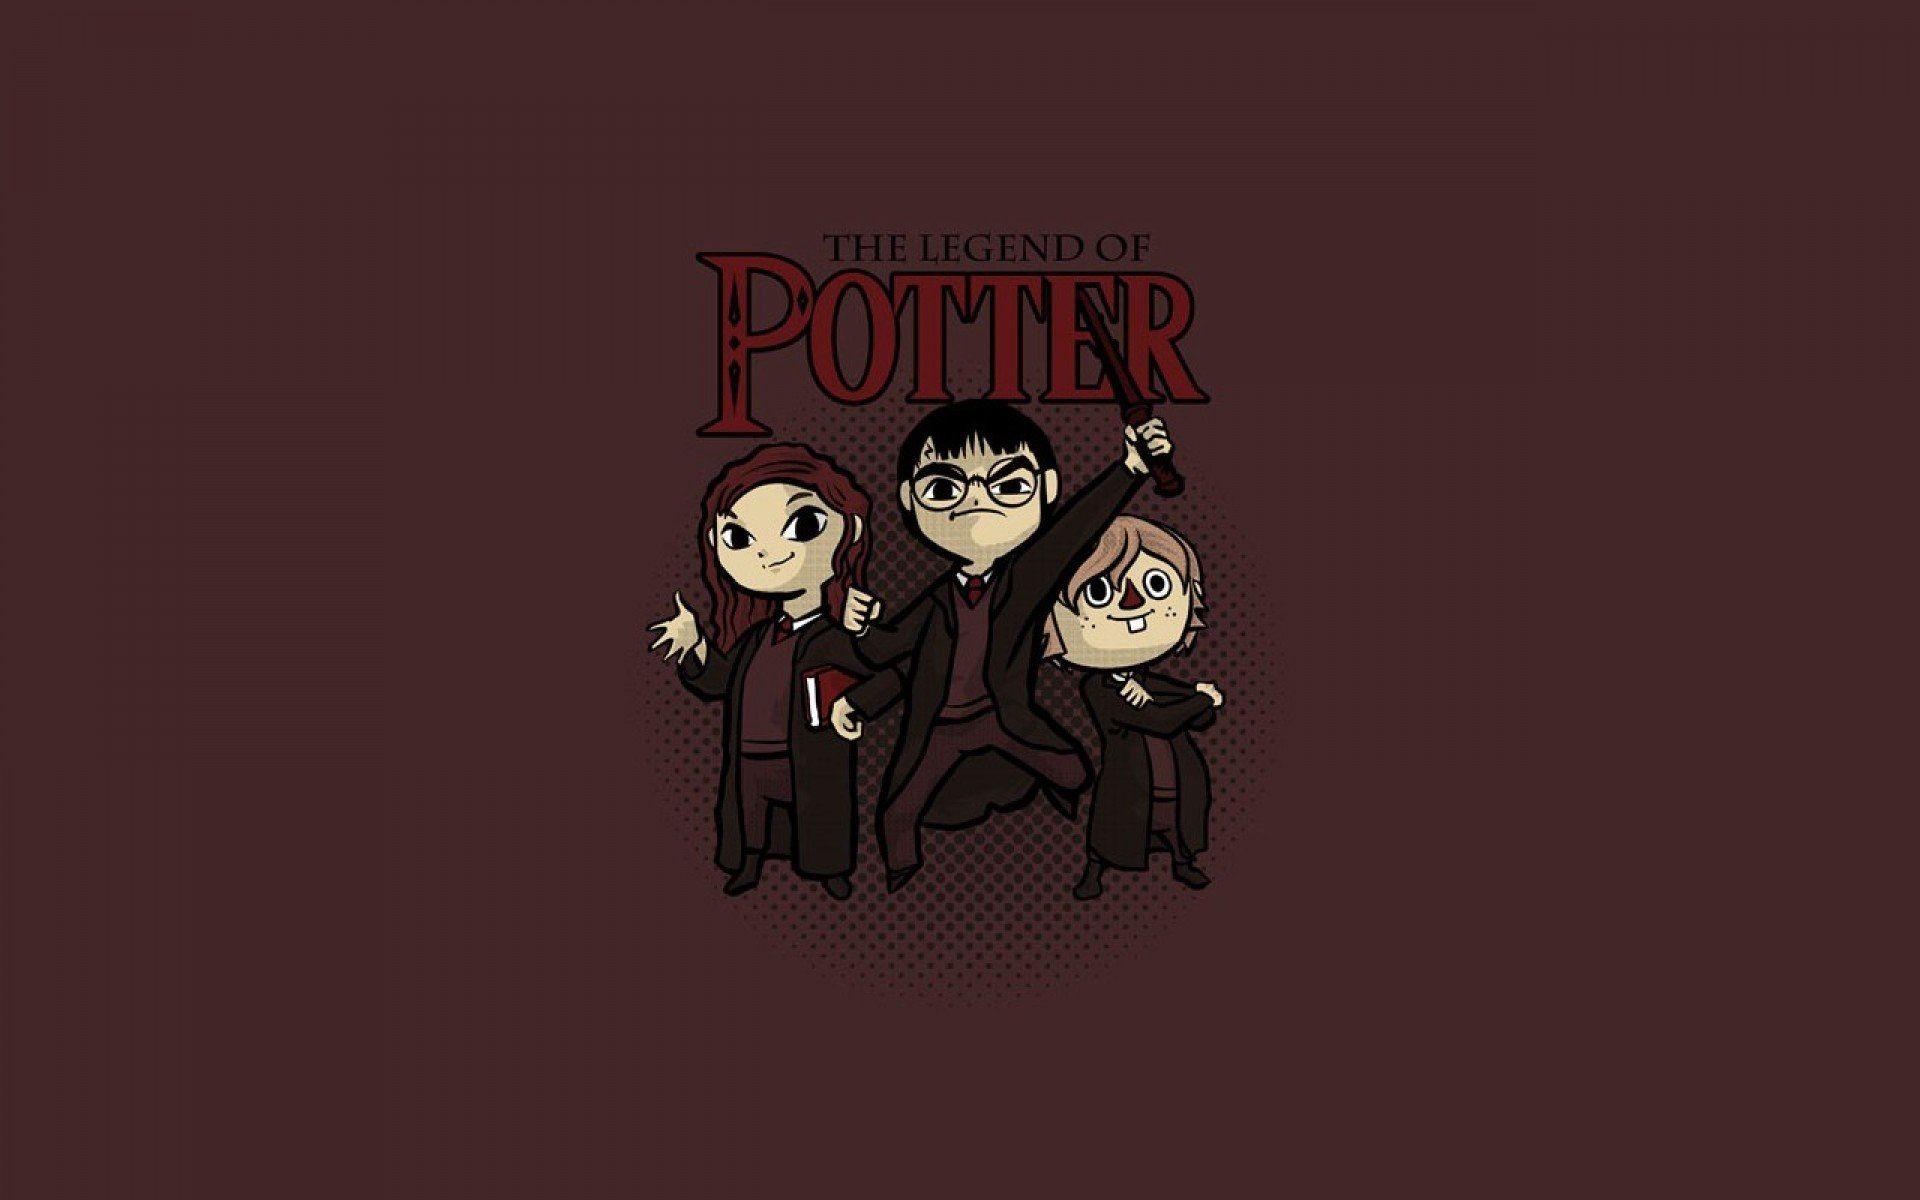 Harry Potter Wallpaper - Harry Potter Wall Paper - HD Wallpaper